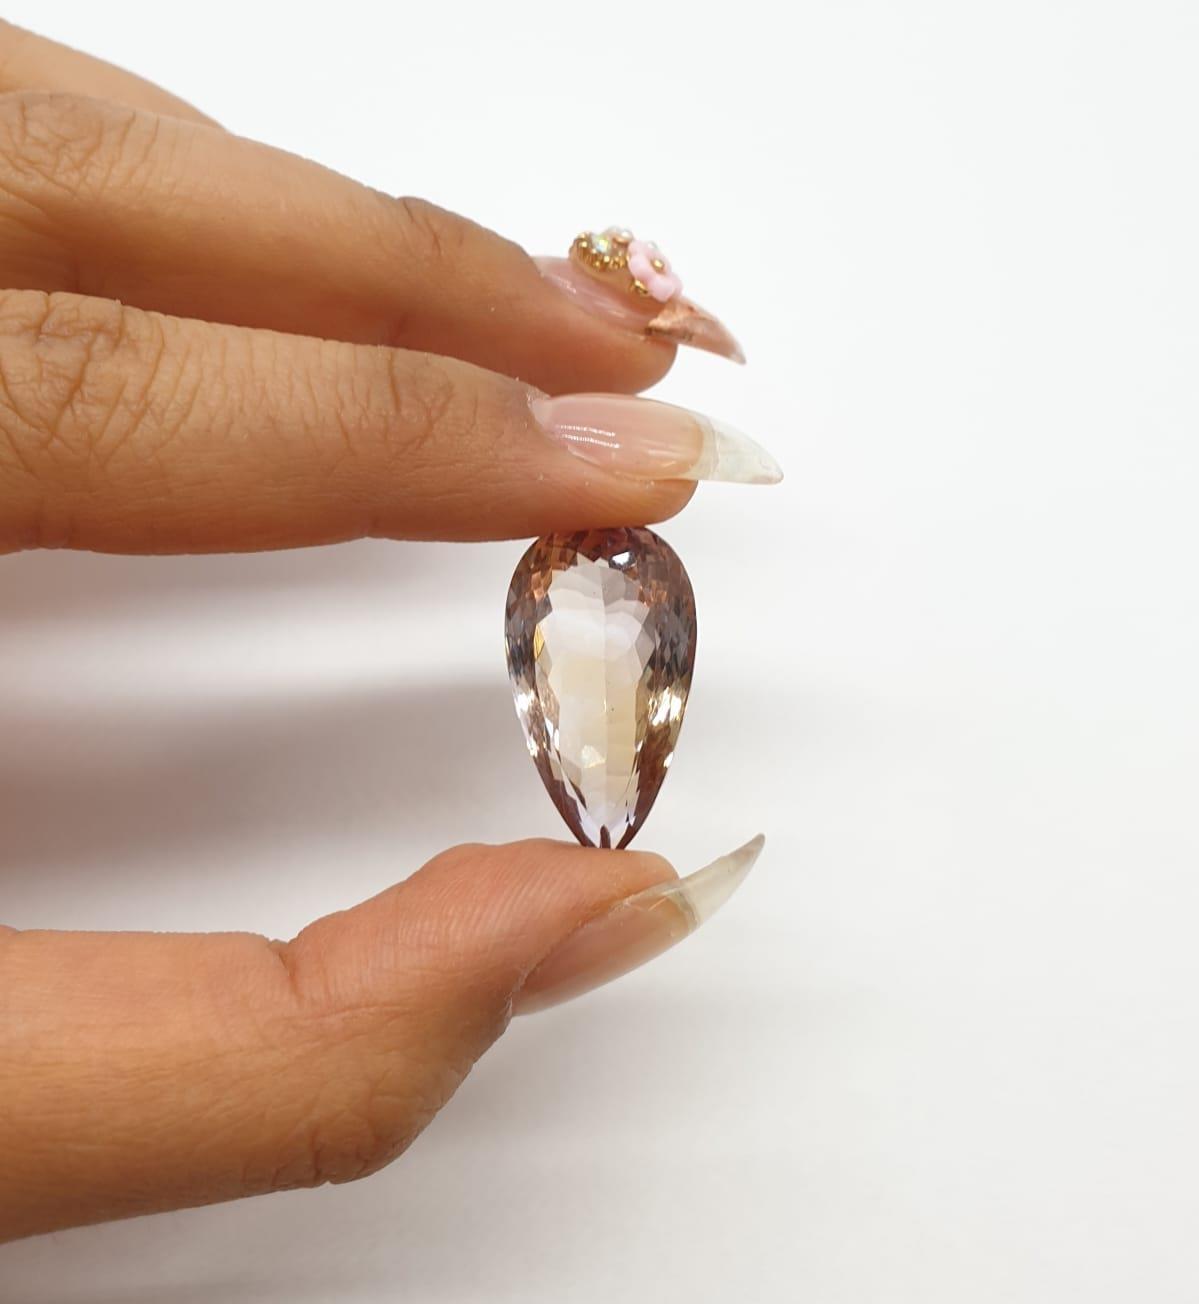 22.14ct Ametrine Pear Shape ITLGR CERTIFIED - Image 6 of 7